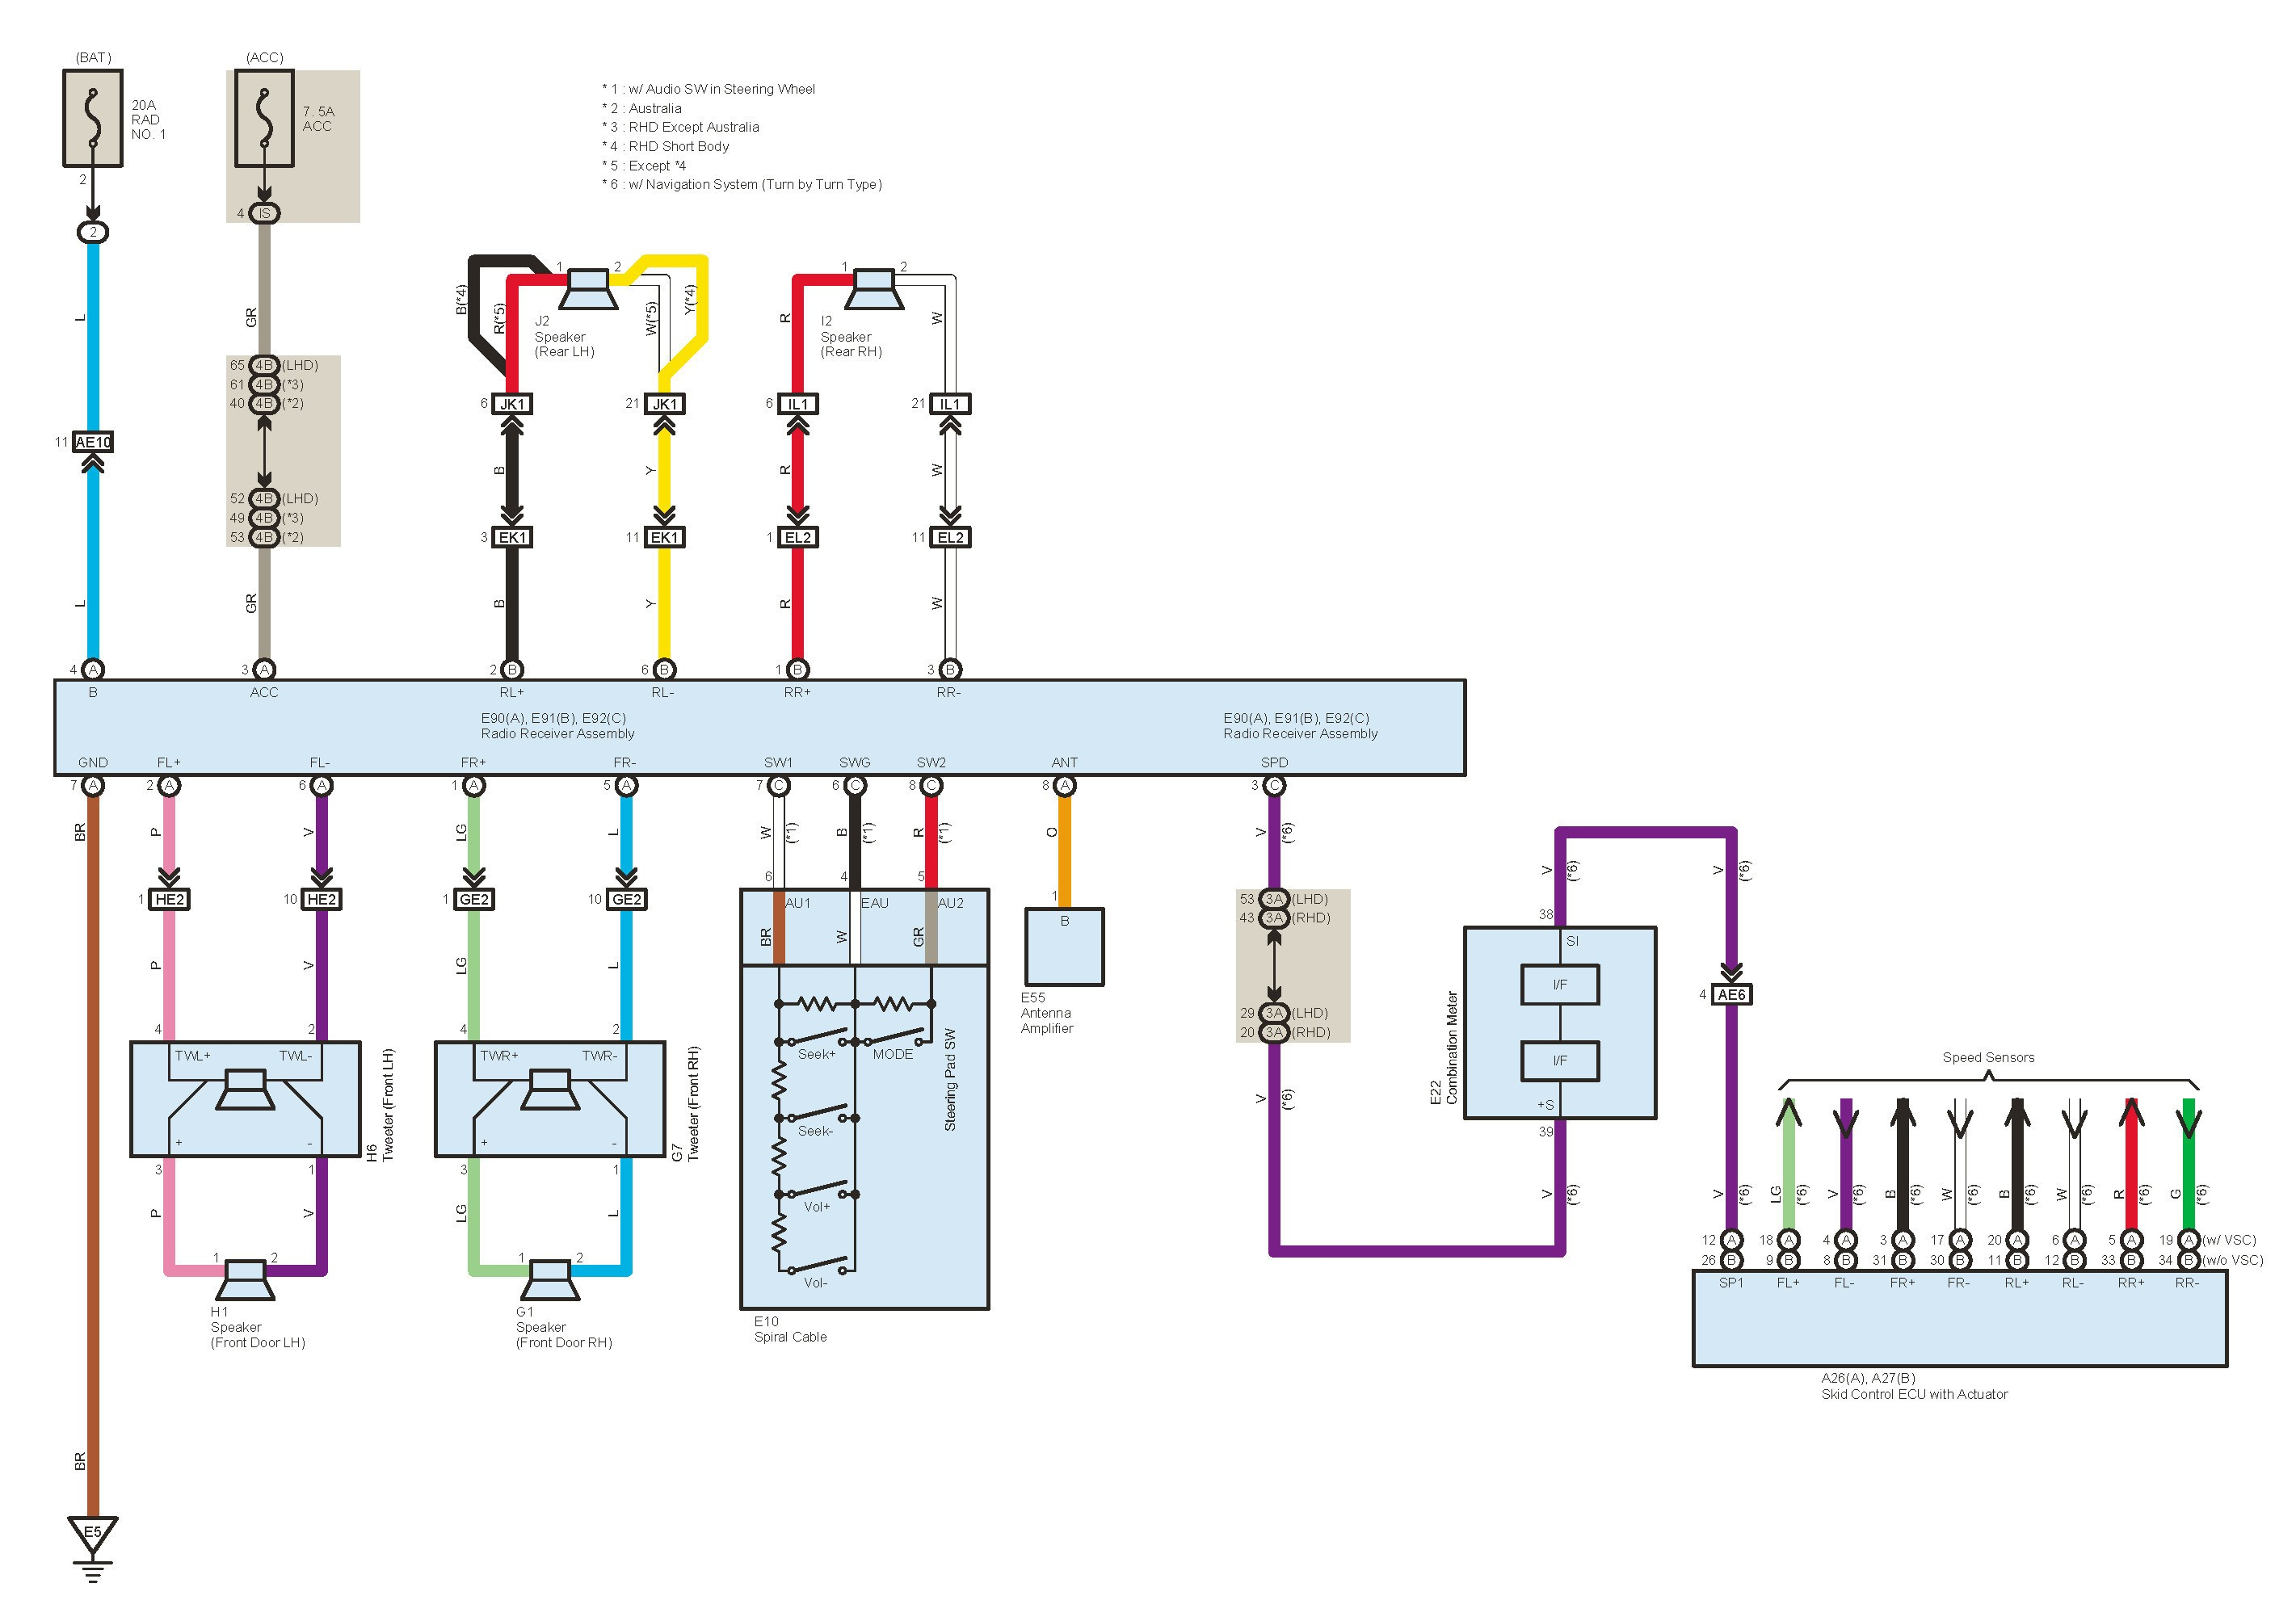 2005 chevrolet equinox wiring diagram bt 4482  sensor wiring diagram 2005 chevy equinox wiring diagram  2005 chevy equinox wiring diagram